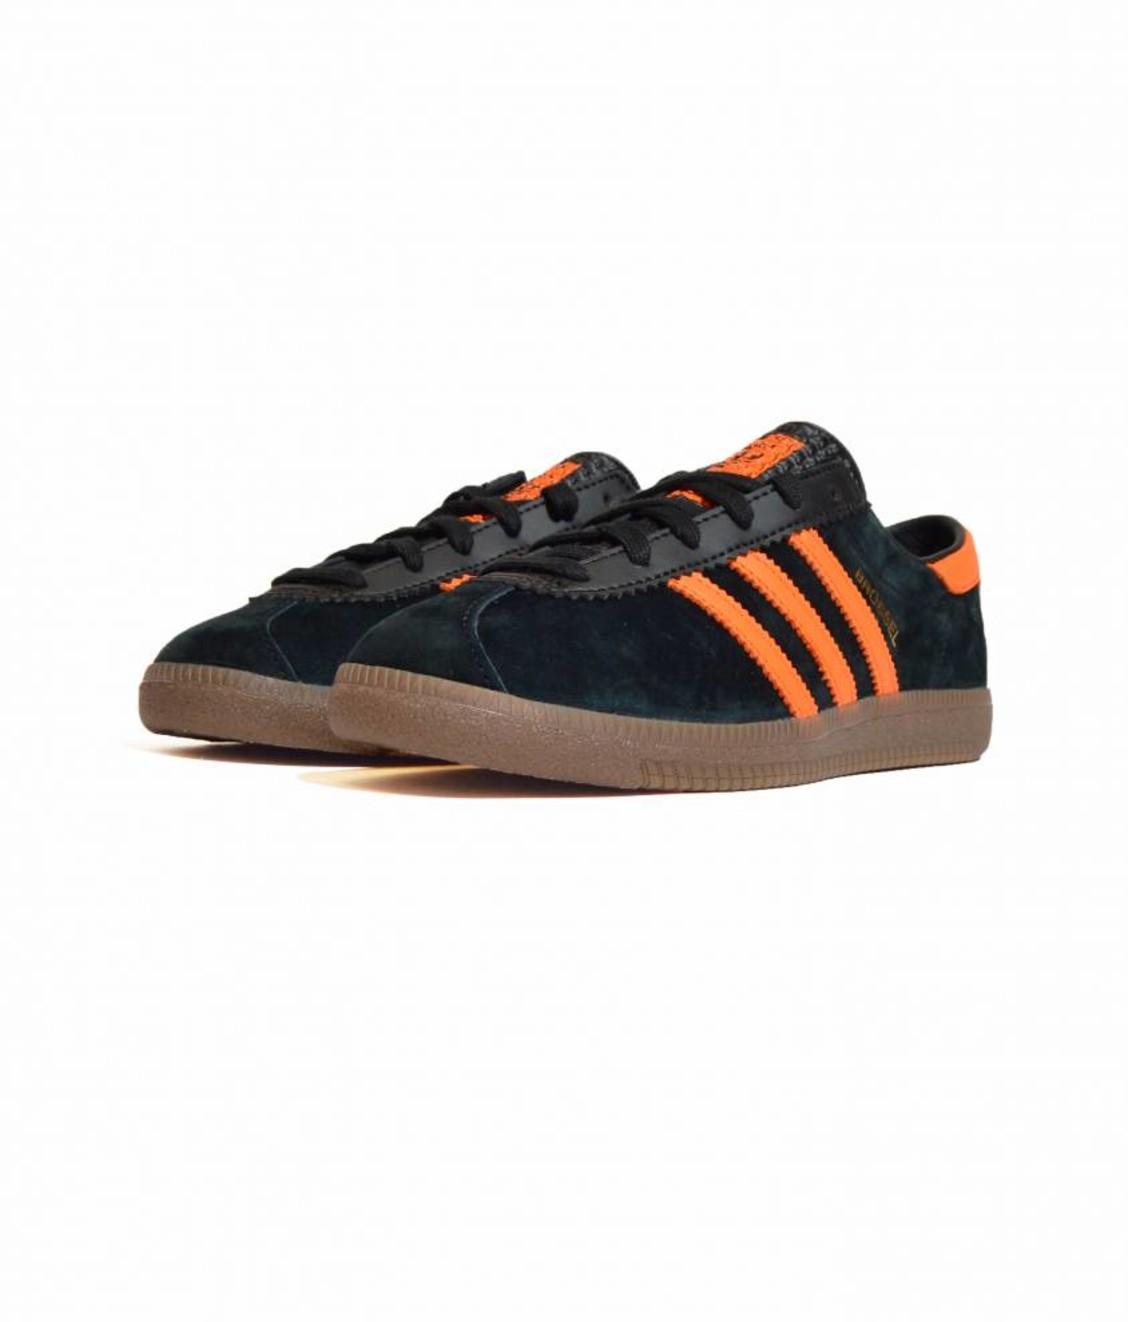 Adidas Adidas Brussels Black Orange